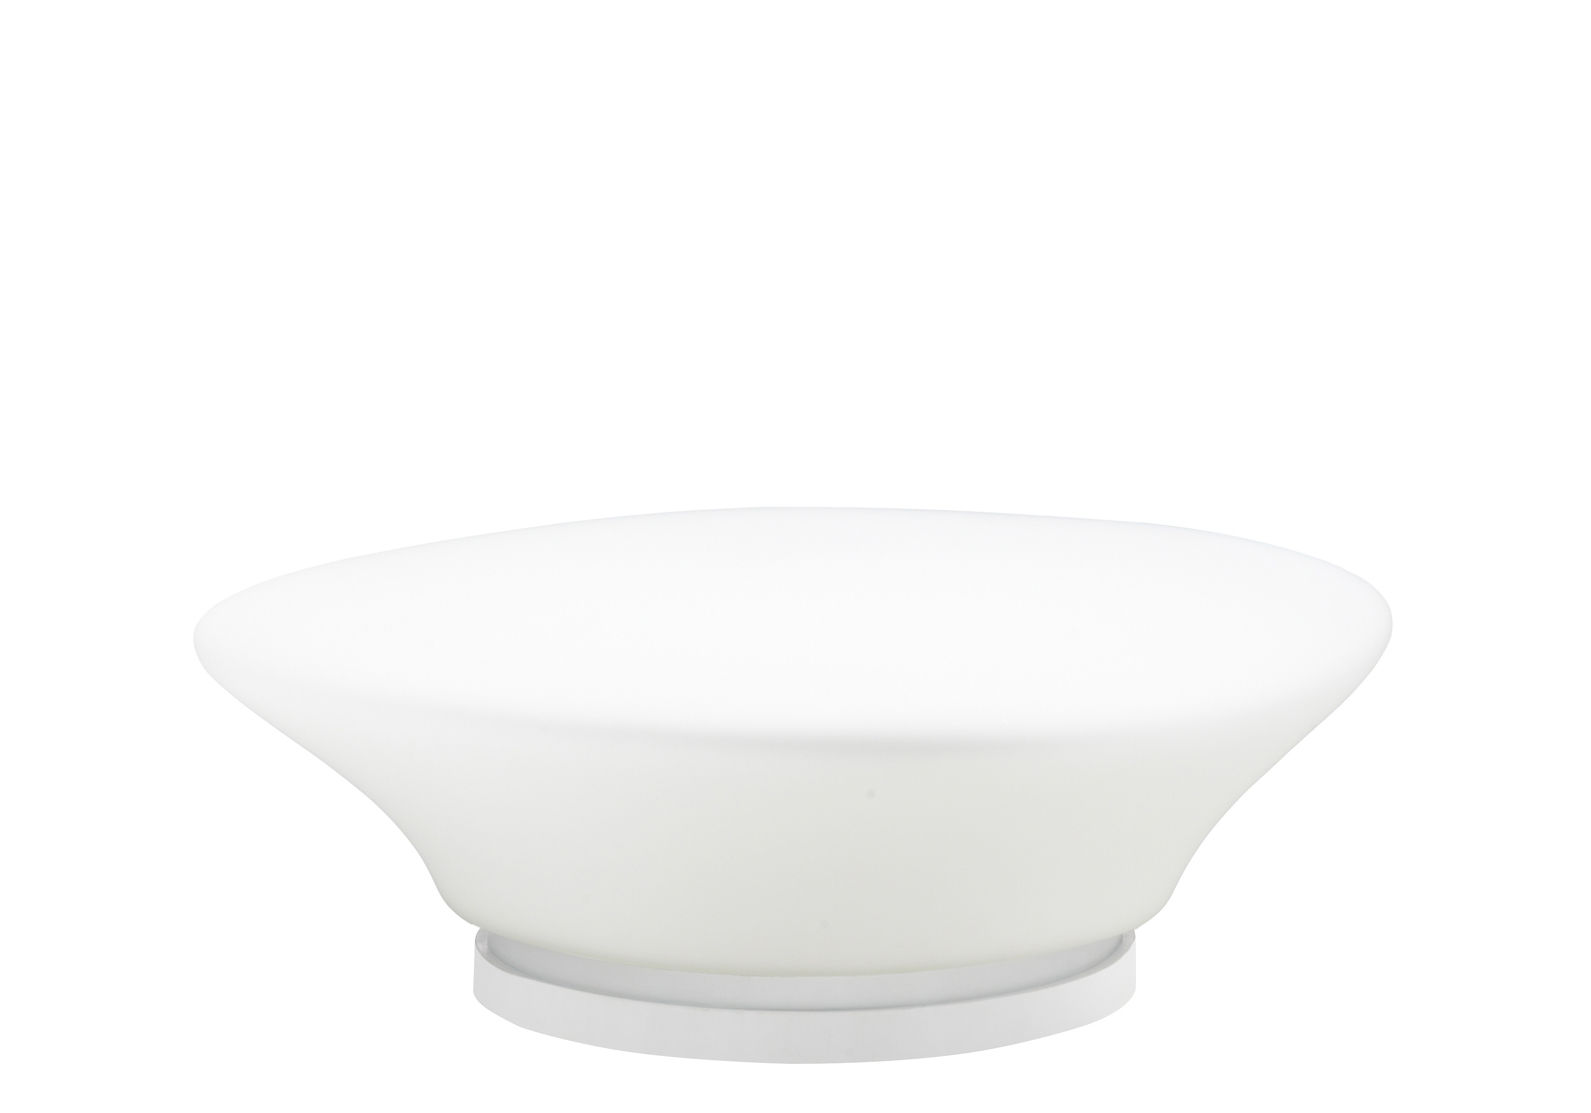 Lighting - Table Lamps - Mycena Table lamp - Ø 38 cm by Fabbian - White - Ø 38 cm - Glass